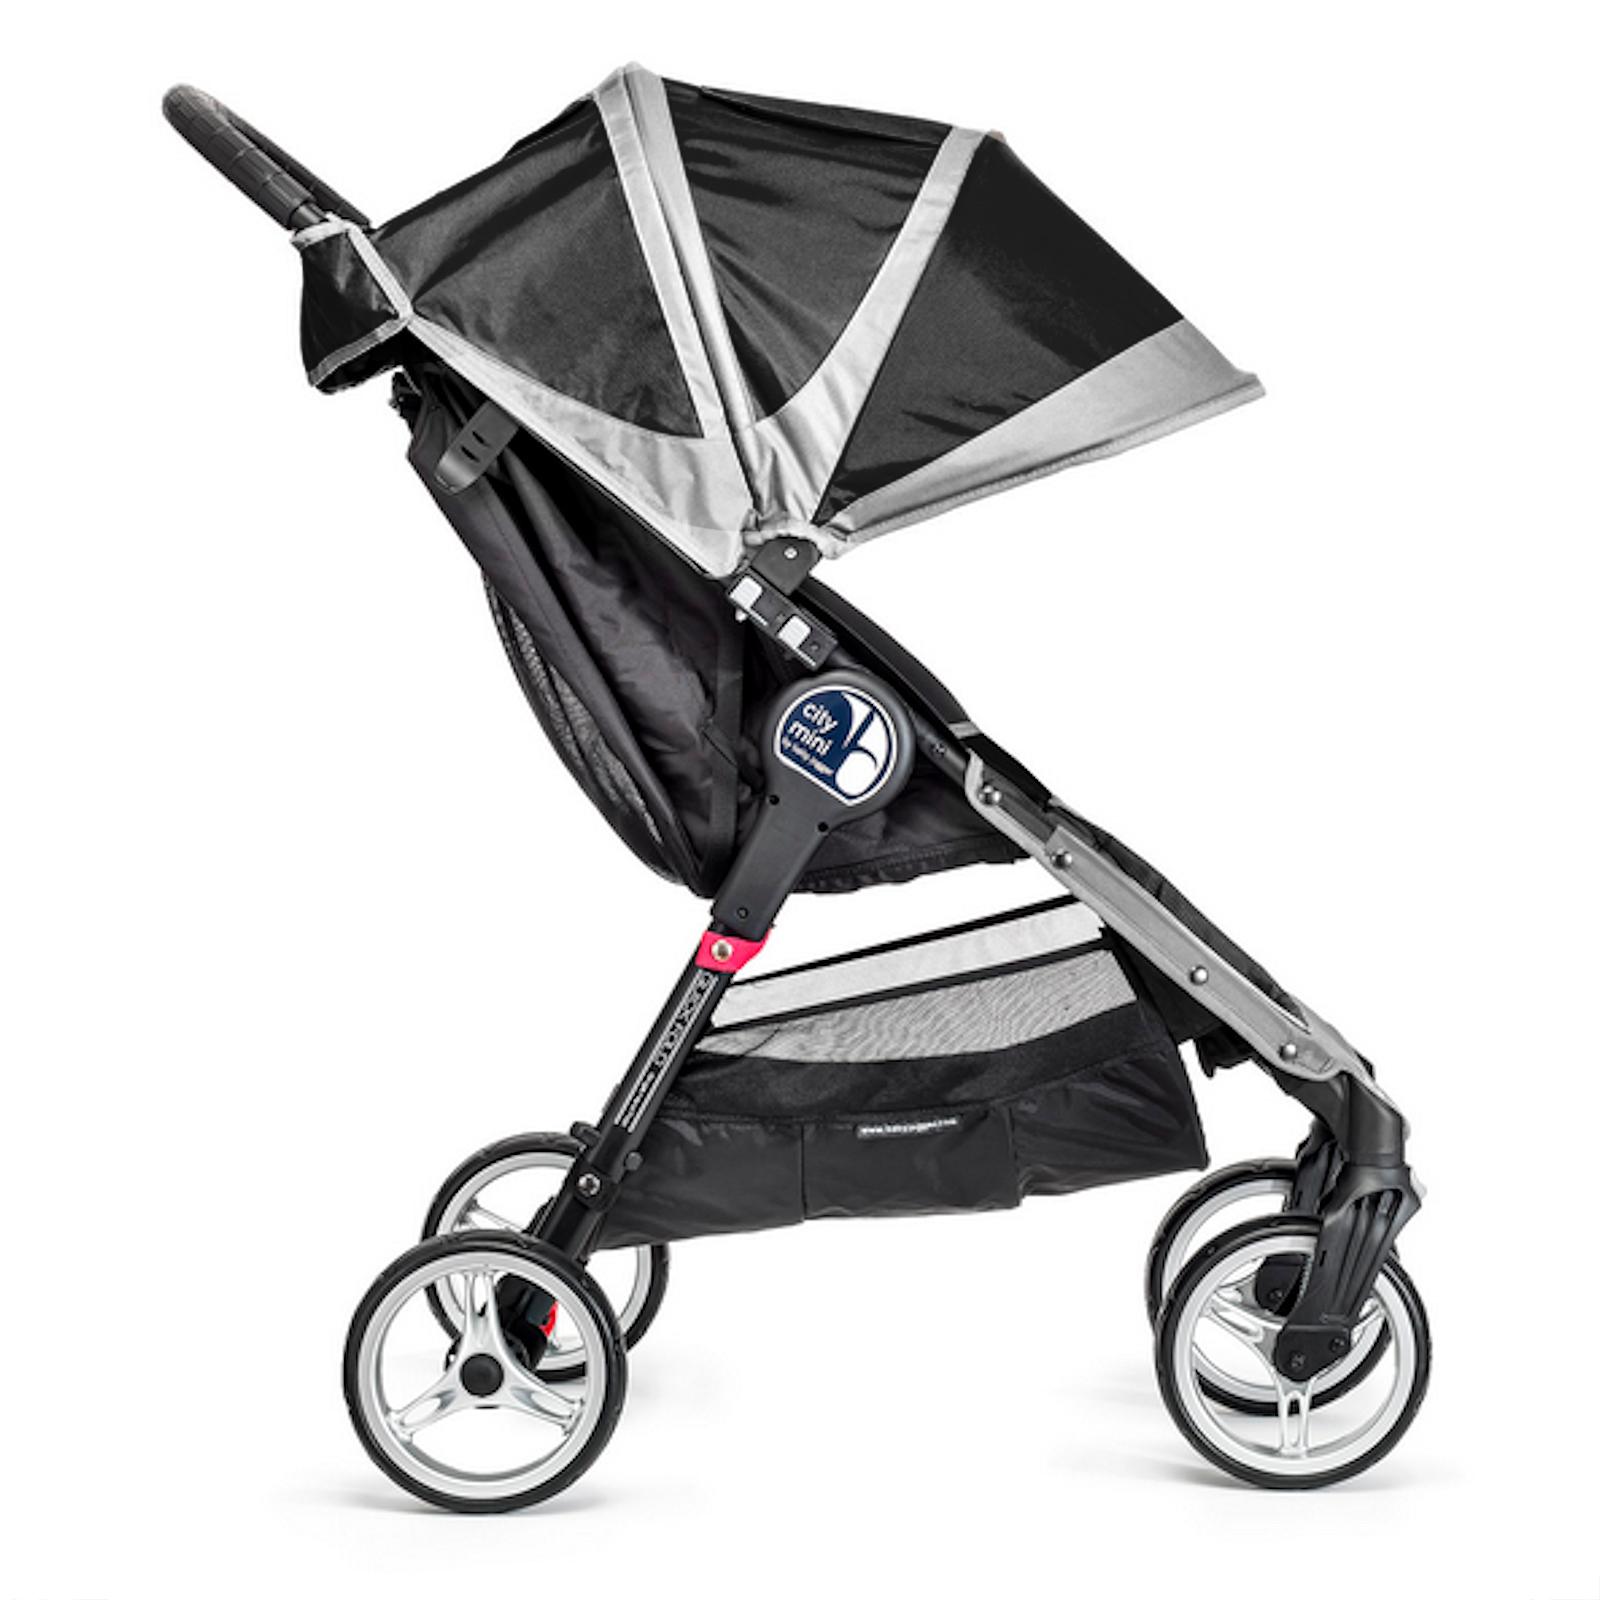 New Baby Jogger City Mini 4 Wheel Single Stroller Black